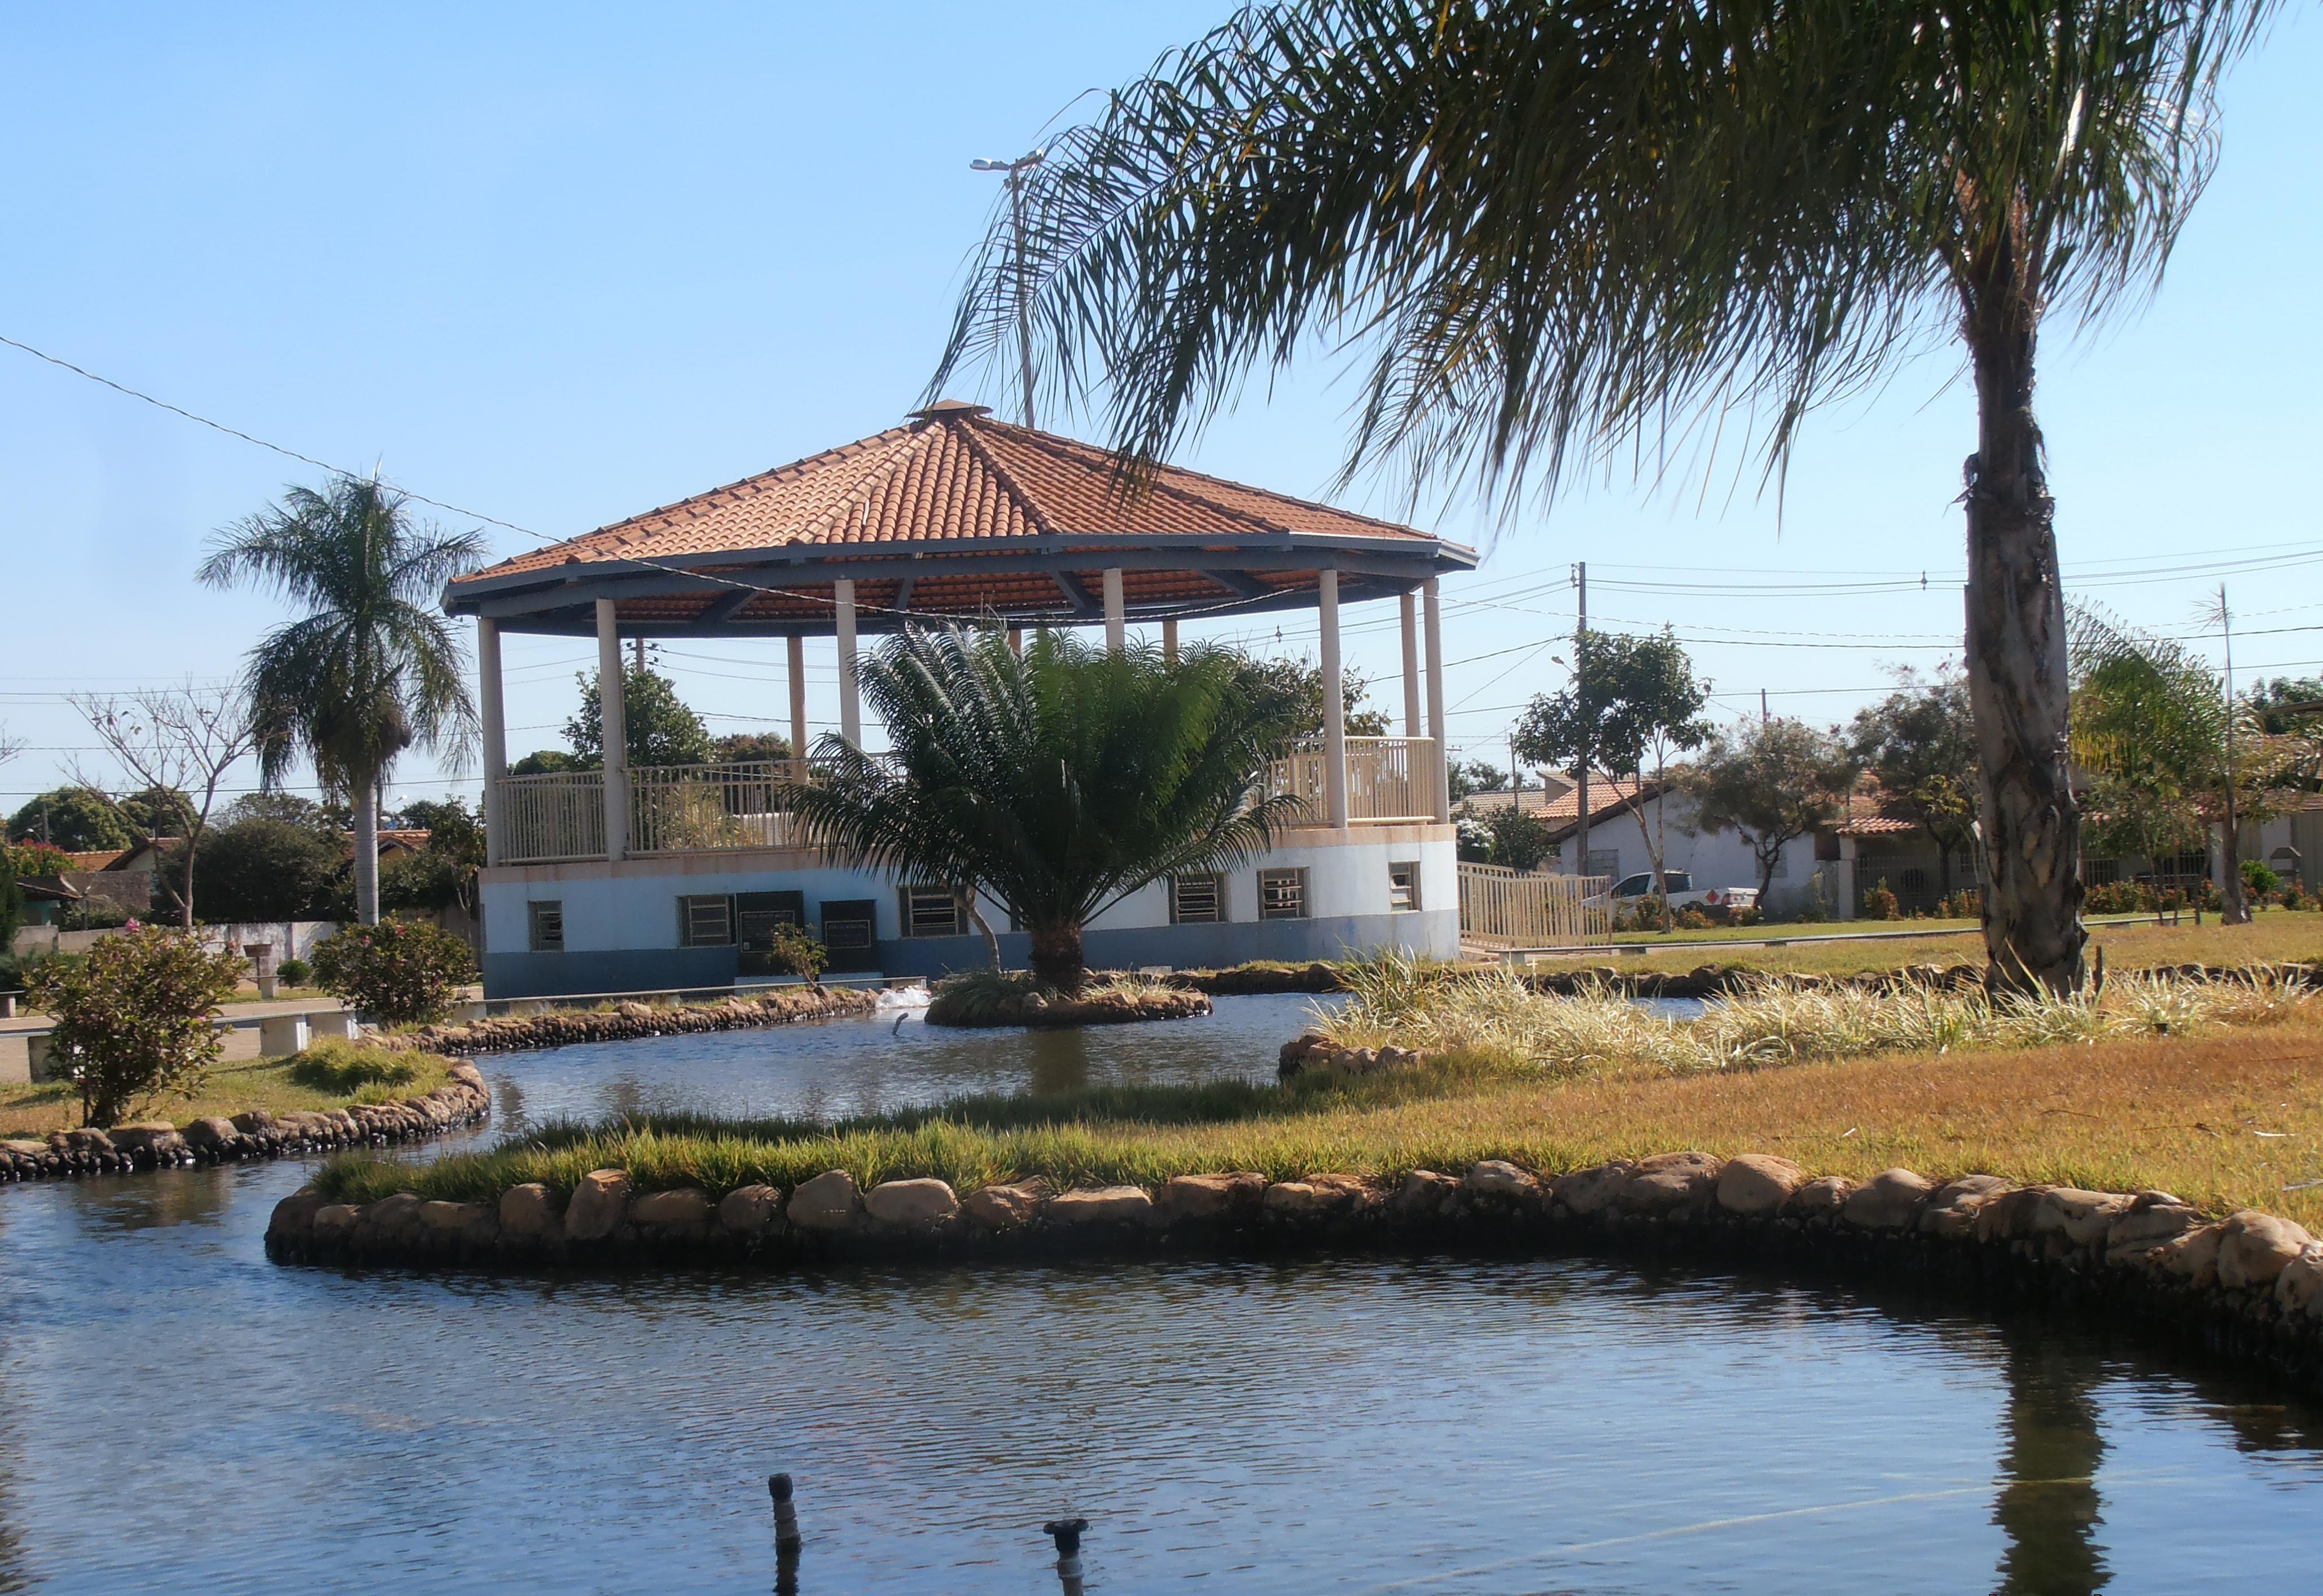 Lagoa Grande Minas Gerais fonte: upload.wikimedia.org